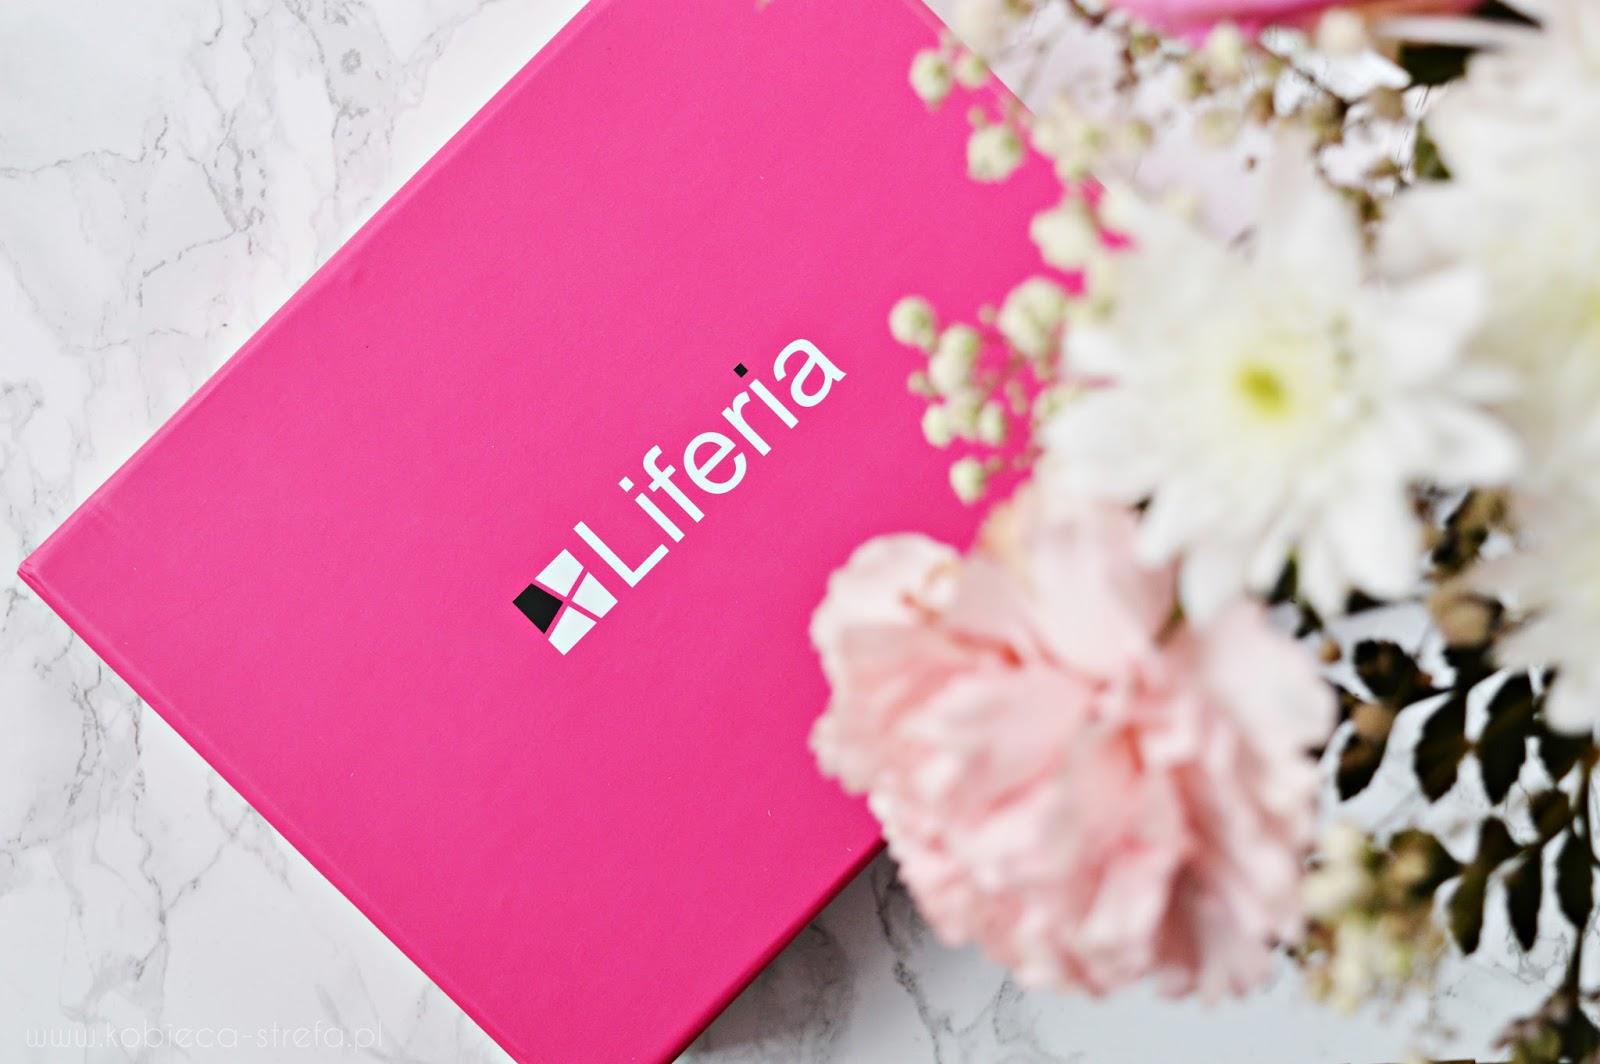 Pudełko Liferia - Kwiecień